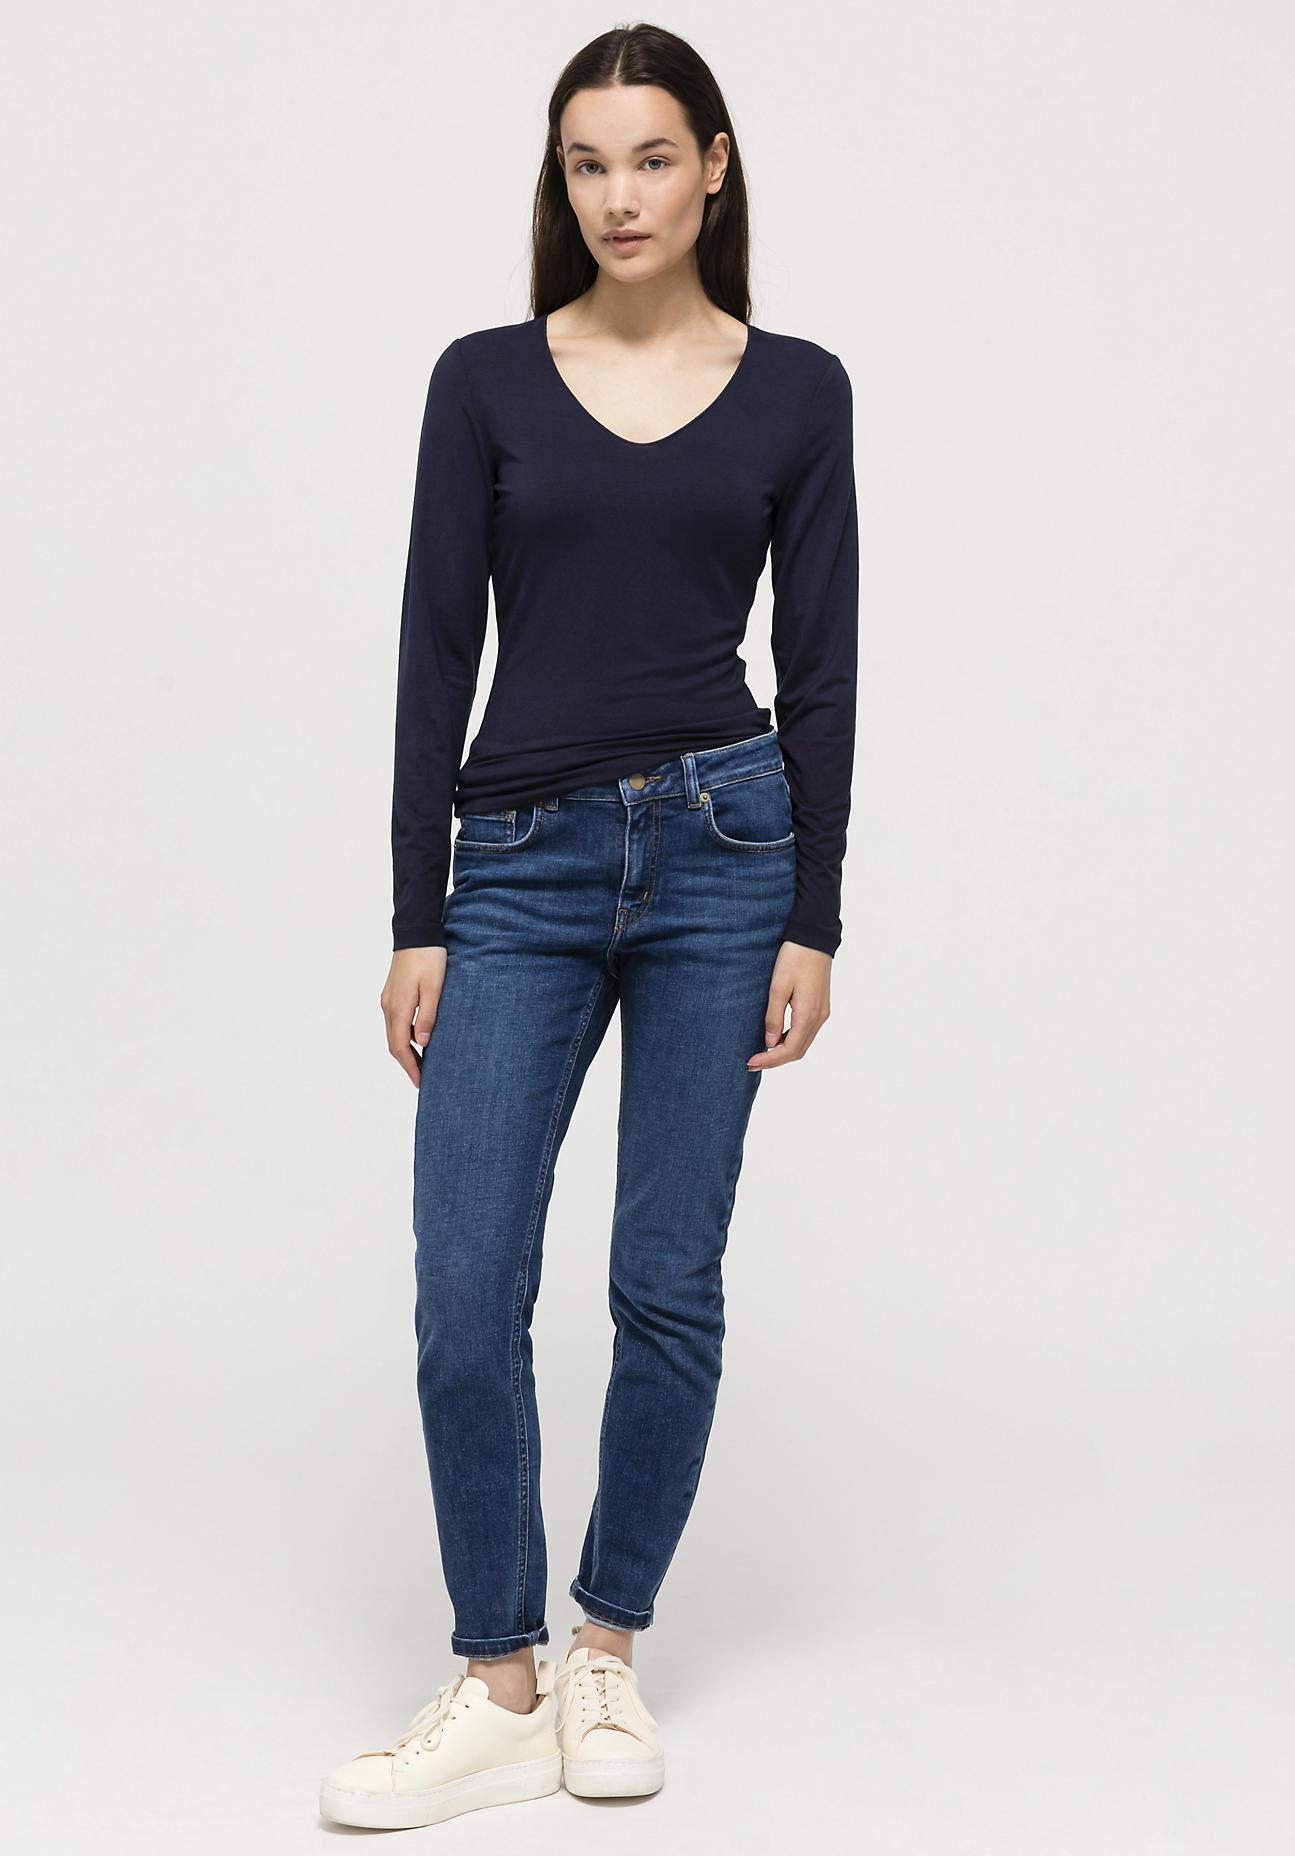 hessnatur Damen Langarm-Shirt aus TENCEL™Modal - blau Größe 36